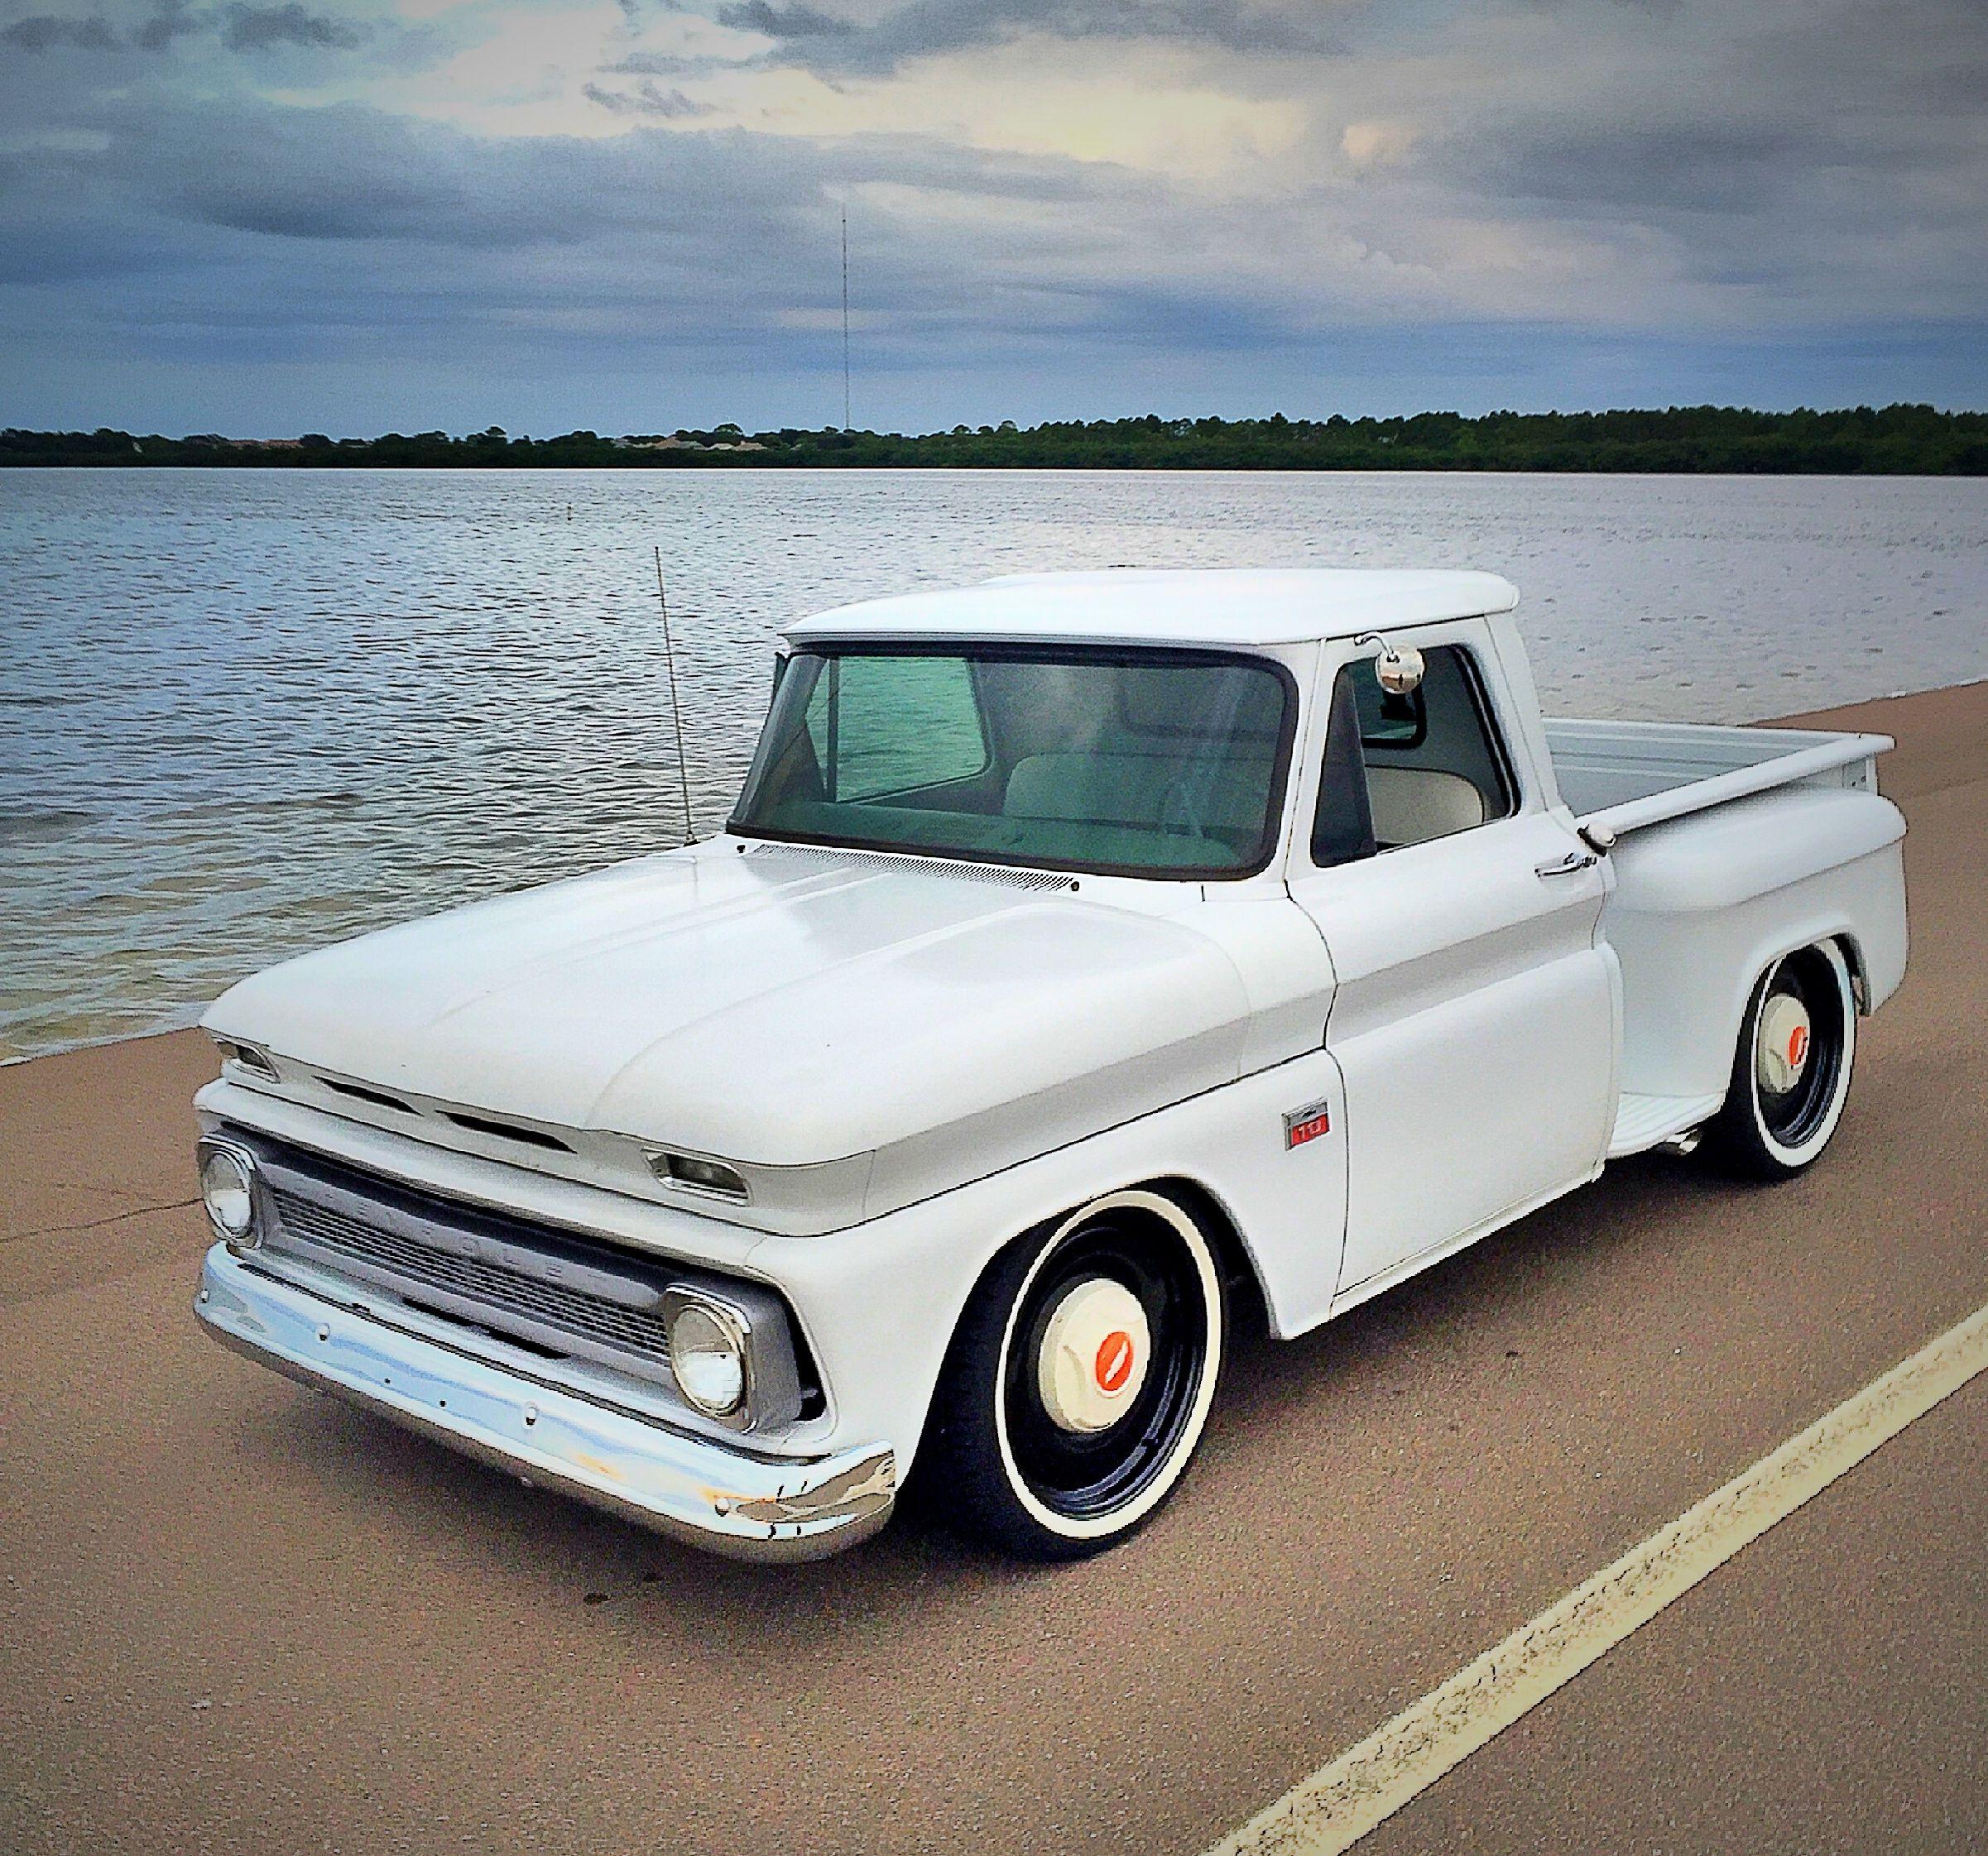 c10 short bed chevy stepside Chevy trucks, Chevy